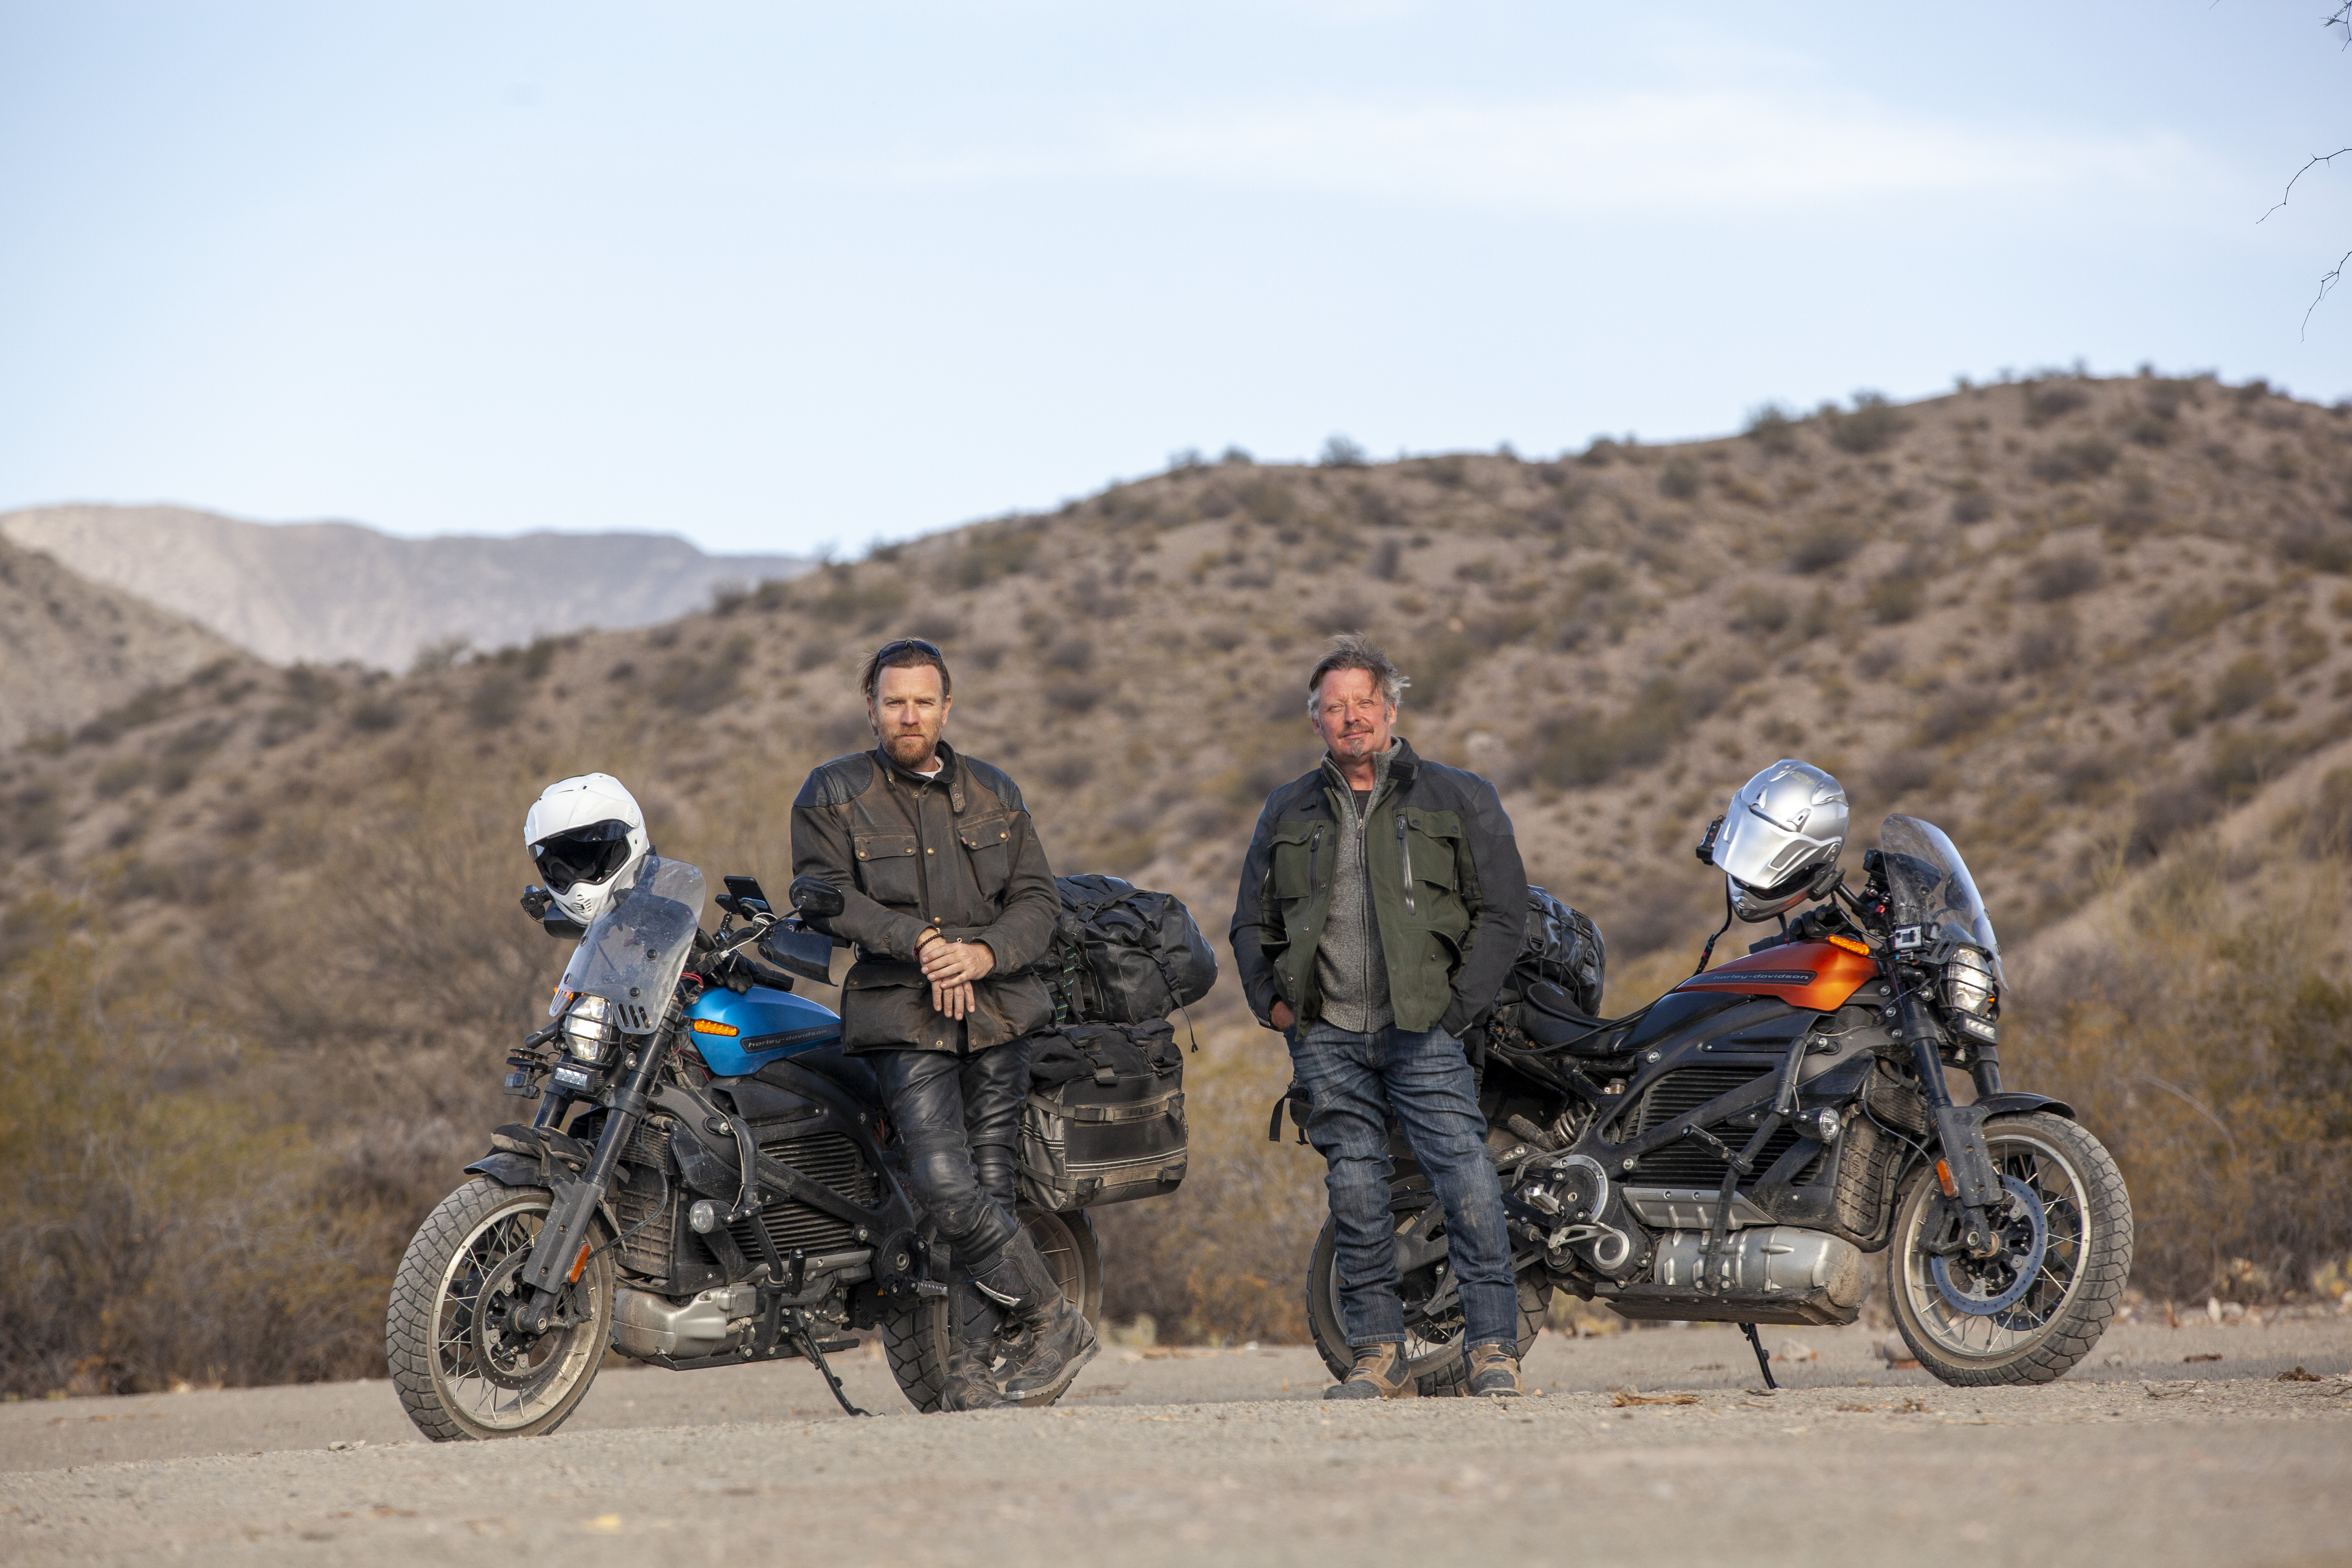 Ewan McGregor and Charley Boorman on electric motorcycle roadtrip